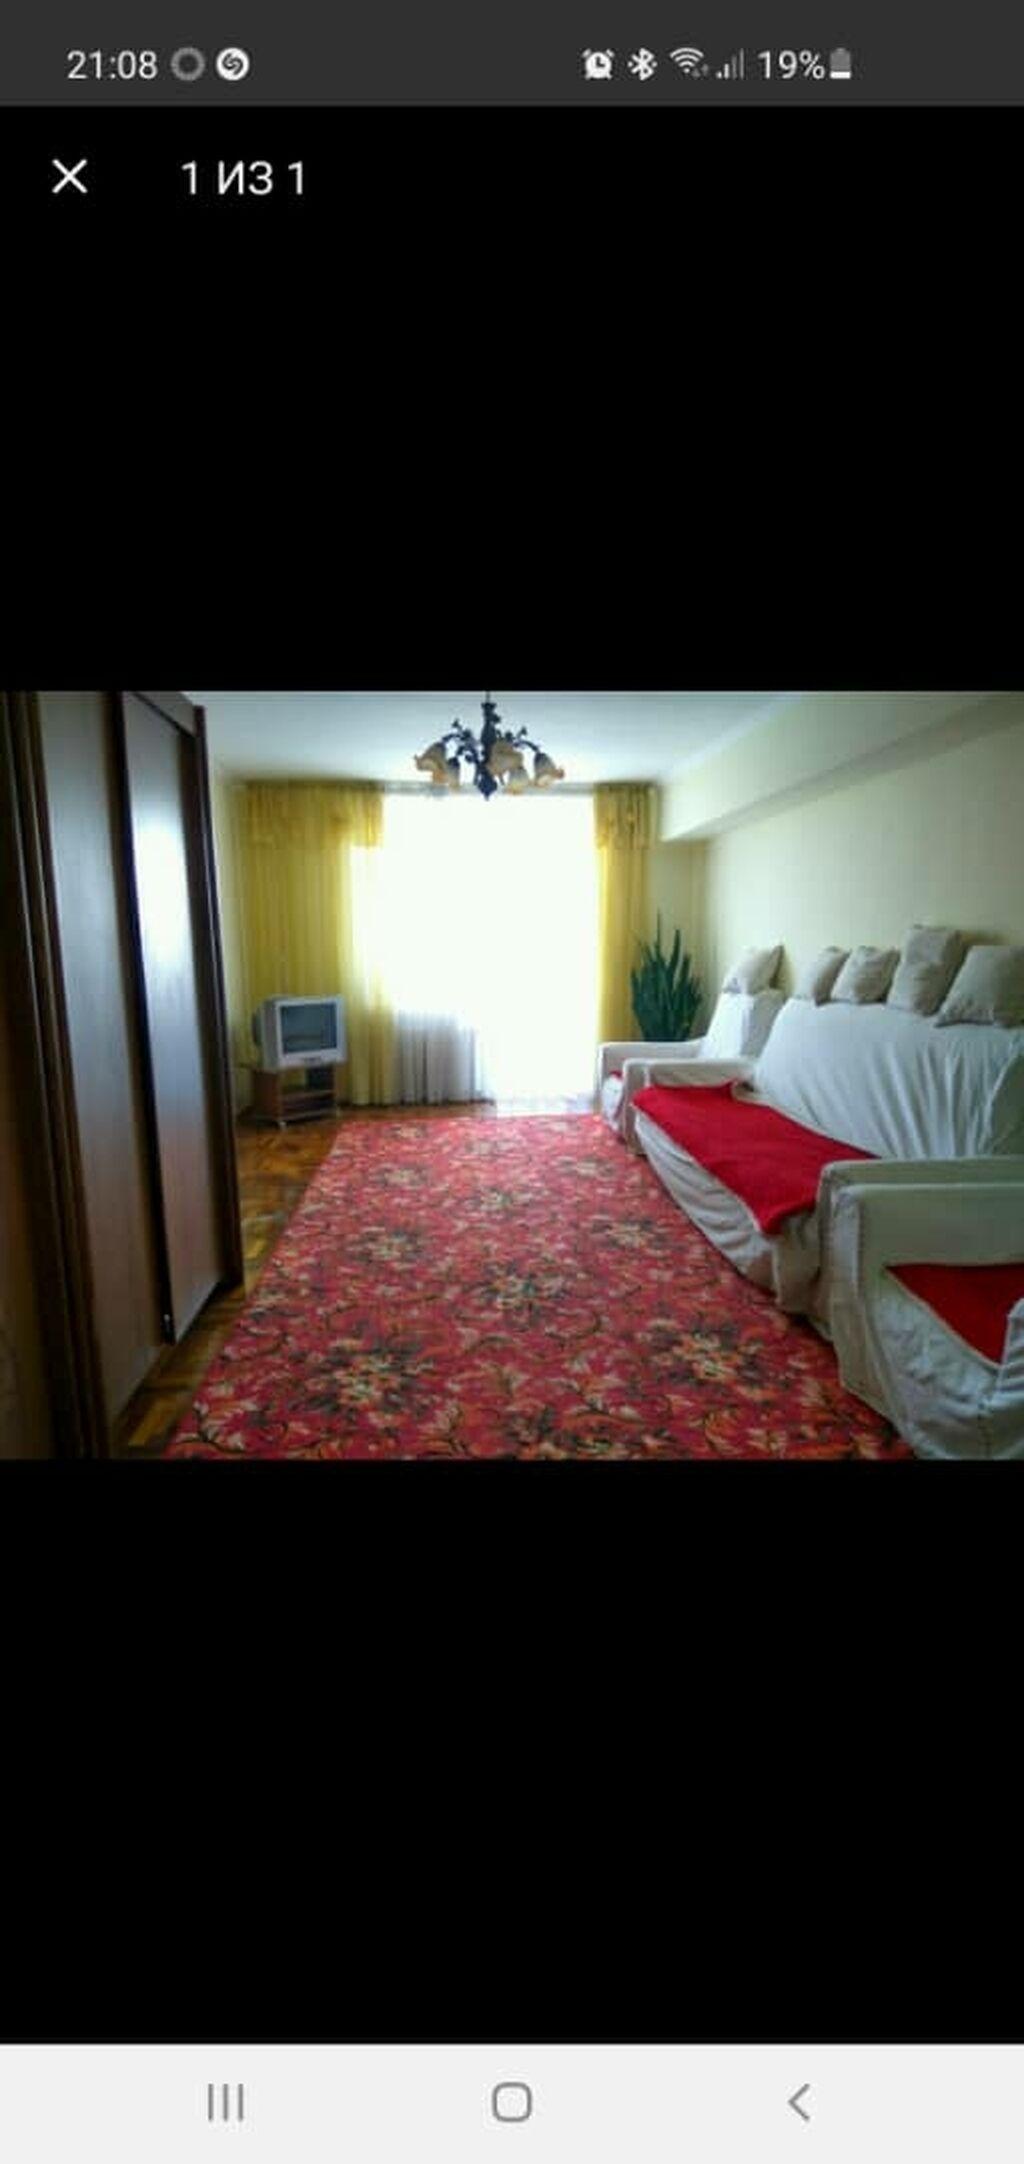 Сдается квартира: 3 комнаты, 60 кв. м, Бишкек: Сдается квартира: 3 комнаты, 60 кв. м, Бишкек